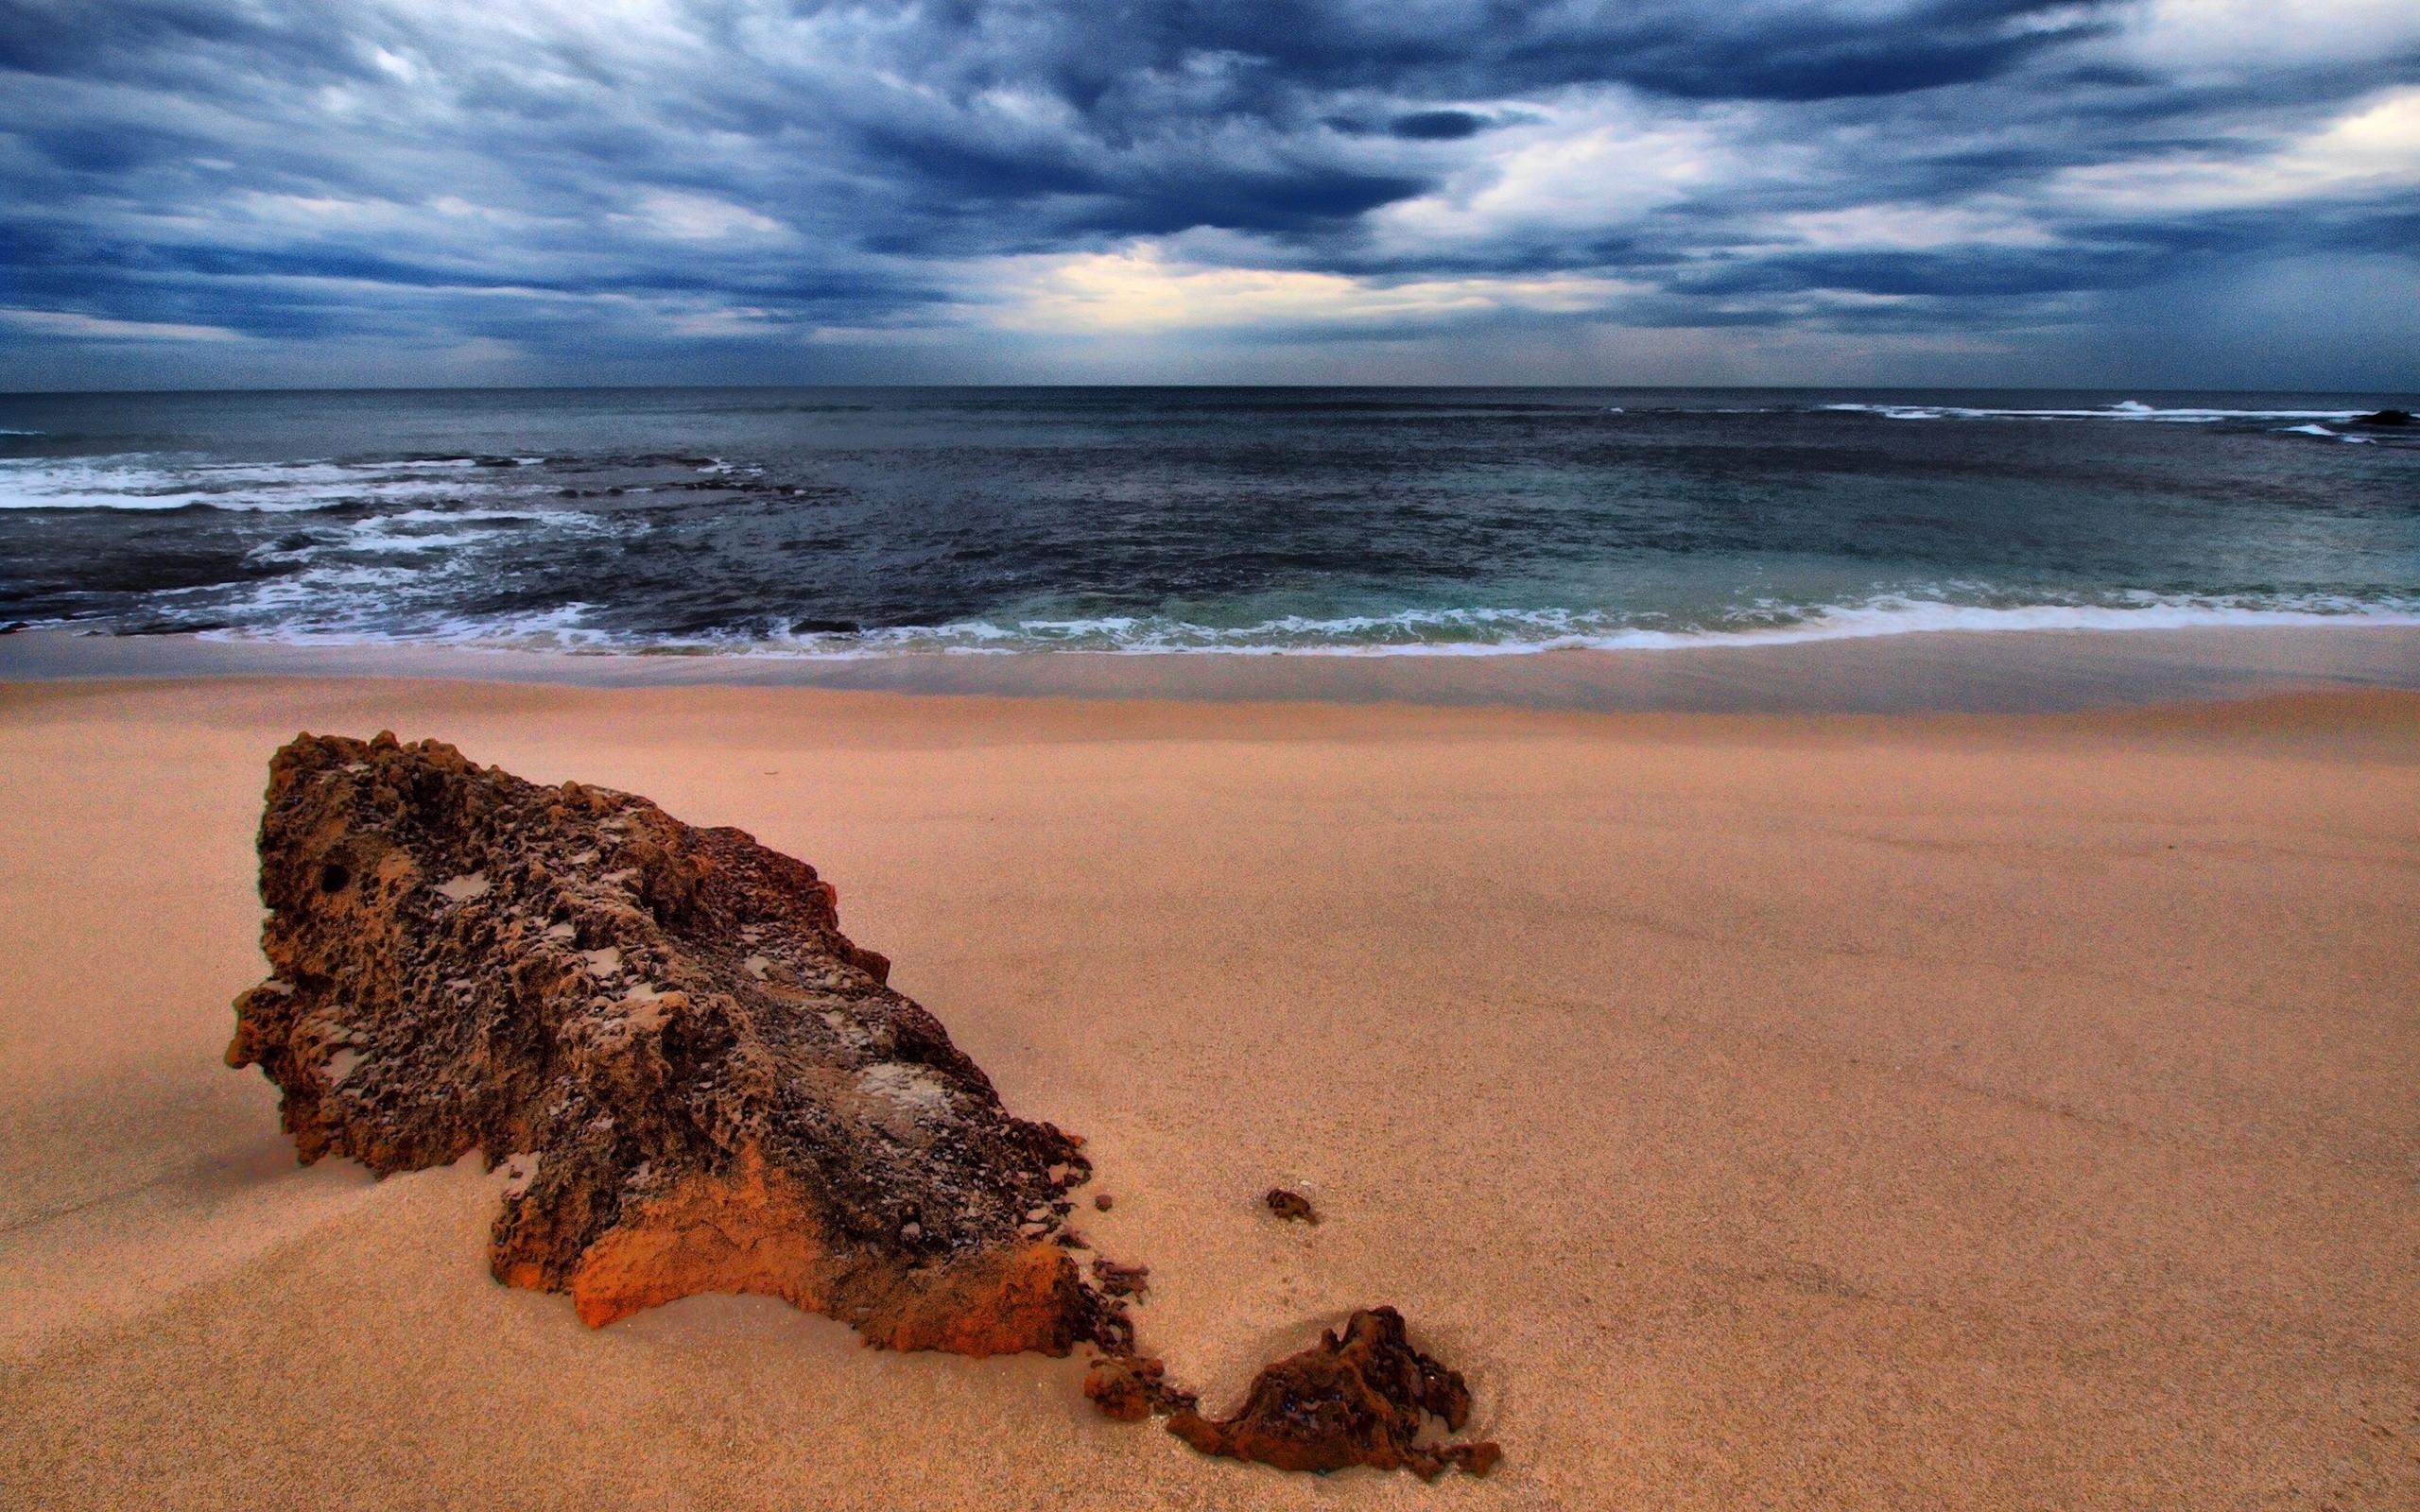 Песок на берегу моря картинки